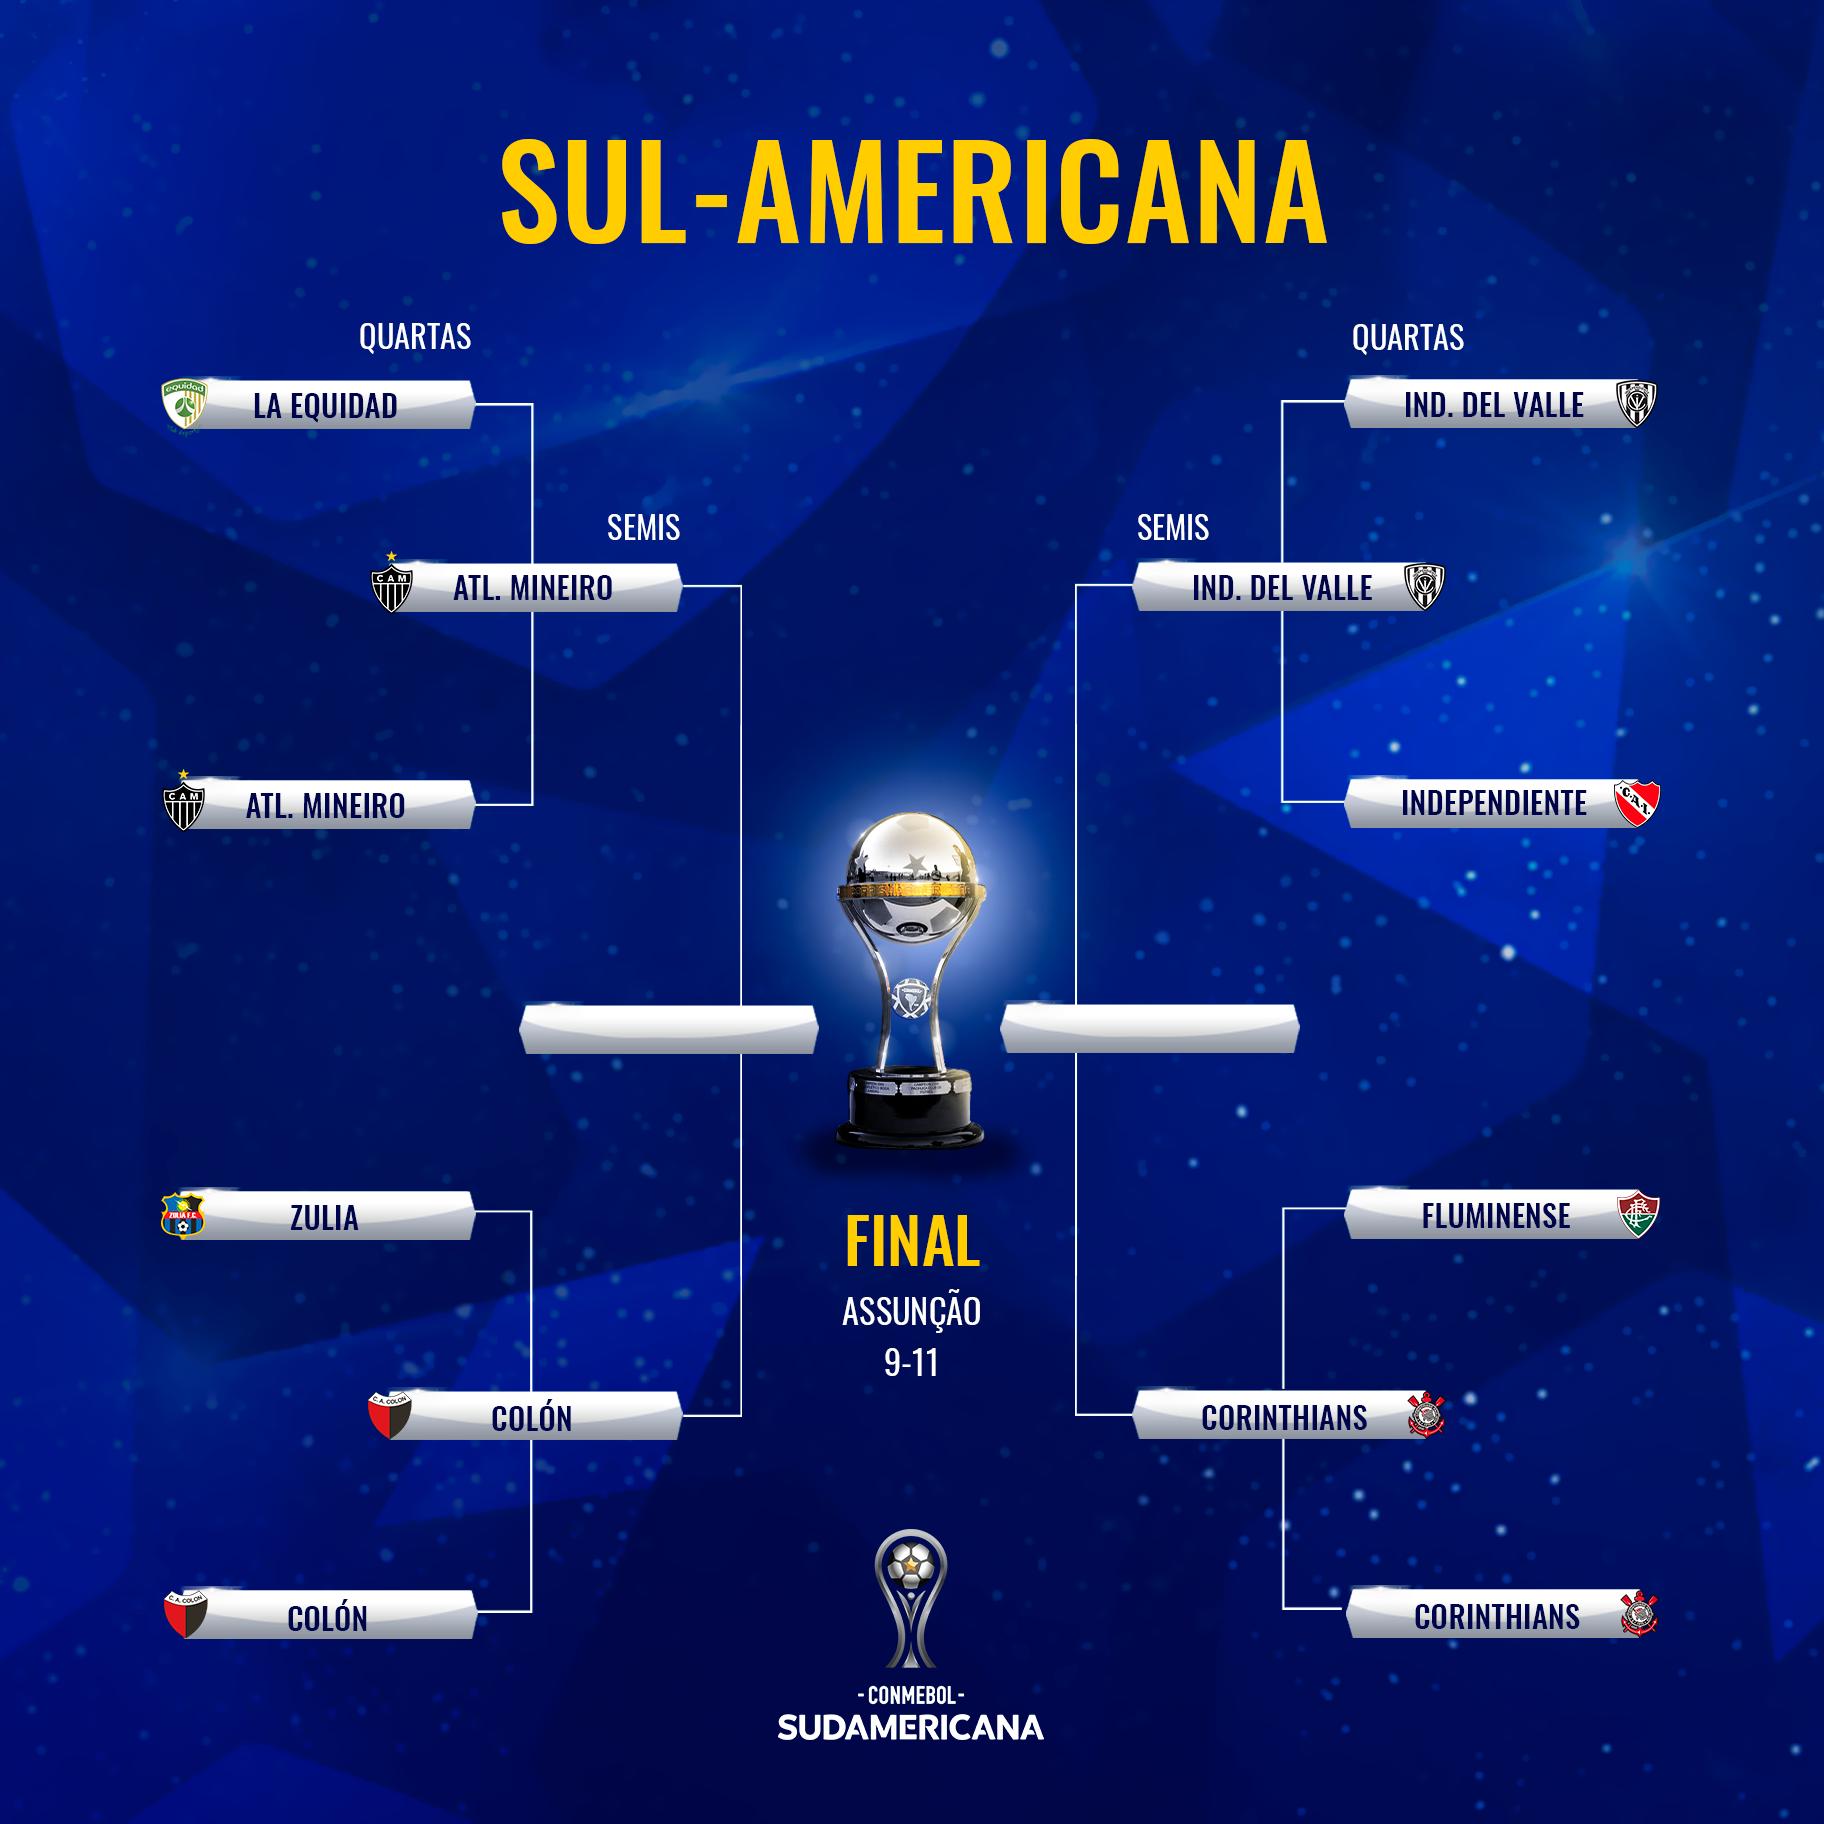 Chaveamento Sul-Americana 2019 semifinais